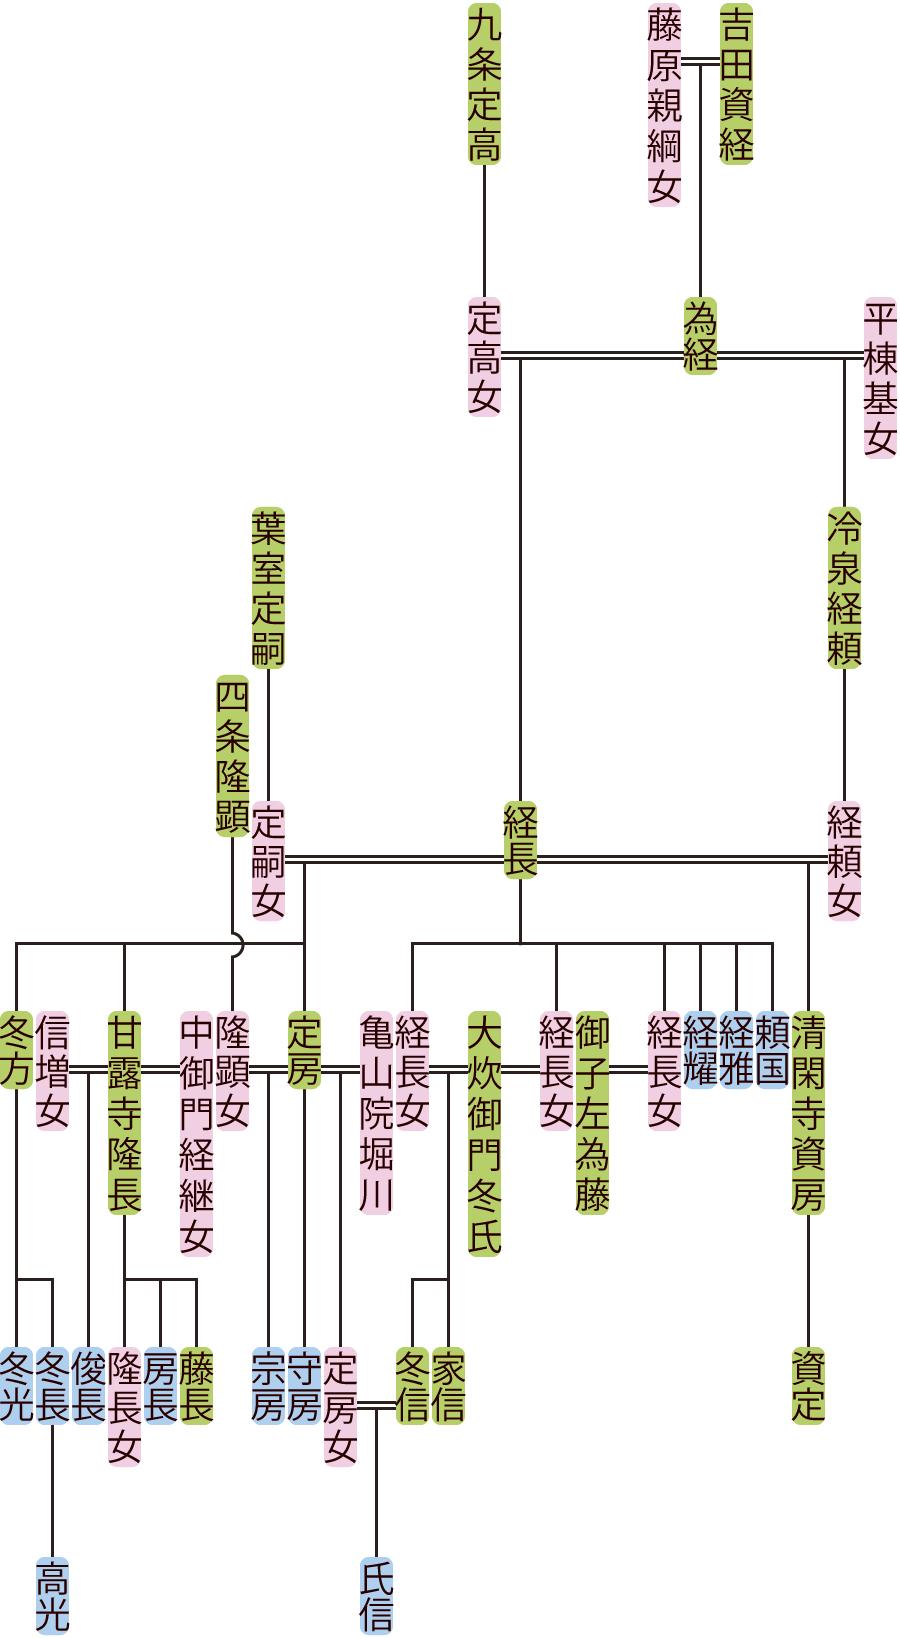 吉田経長の系図